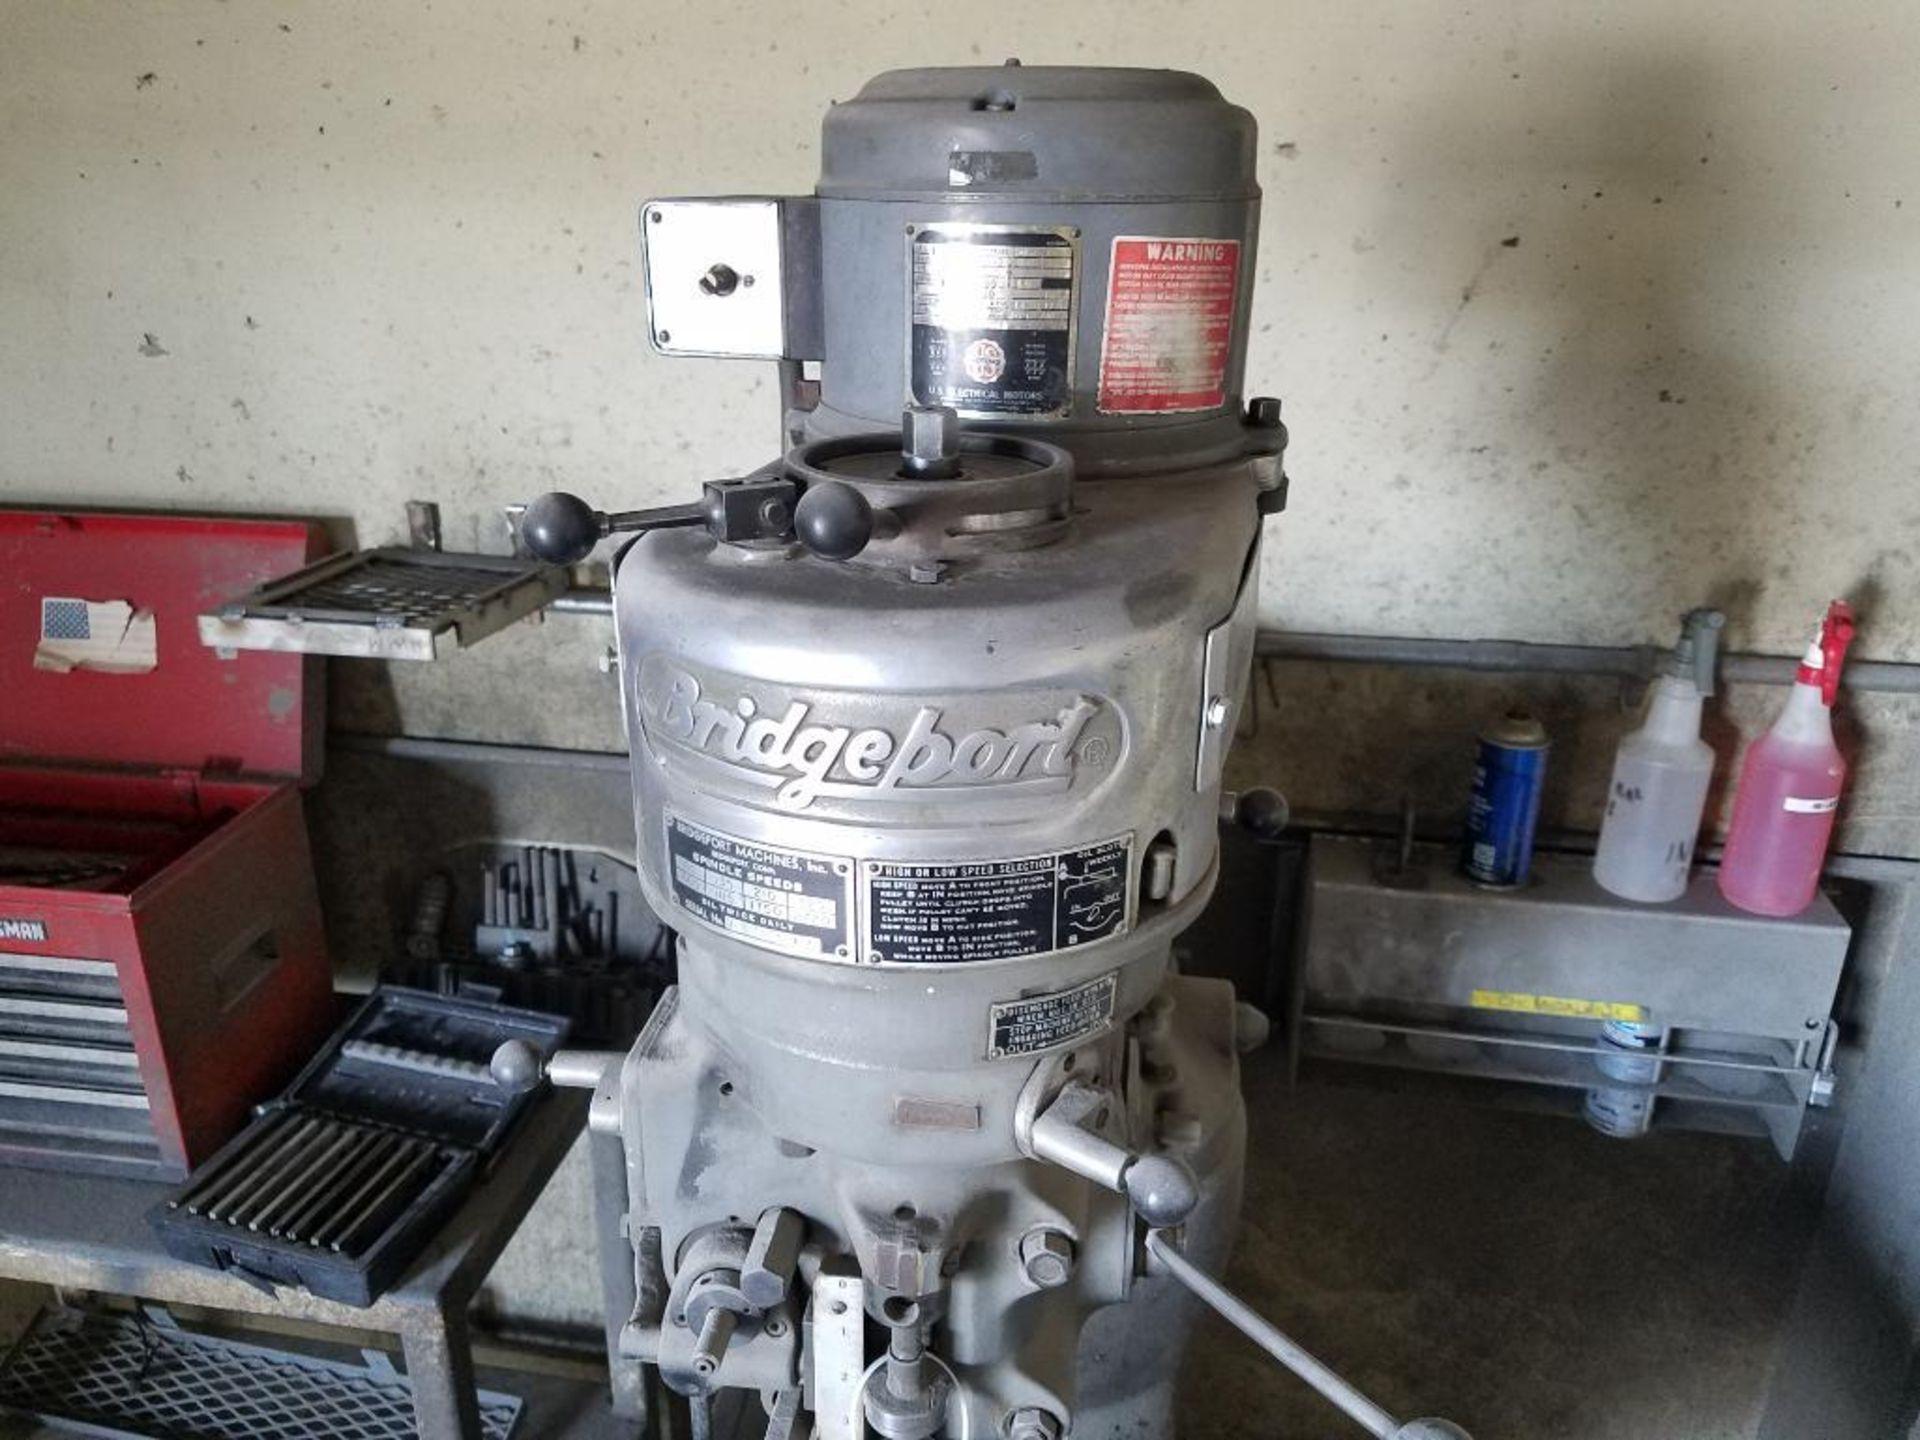 Bridgeport manual mill - Image 4 of 8